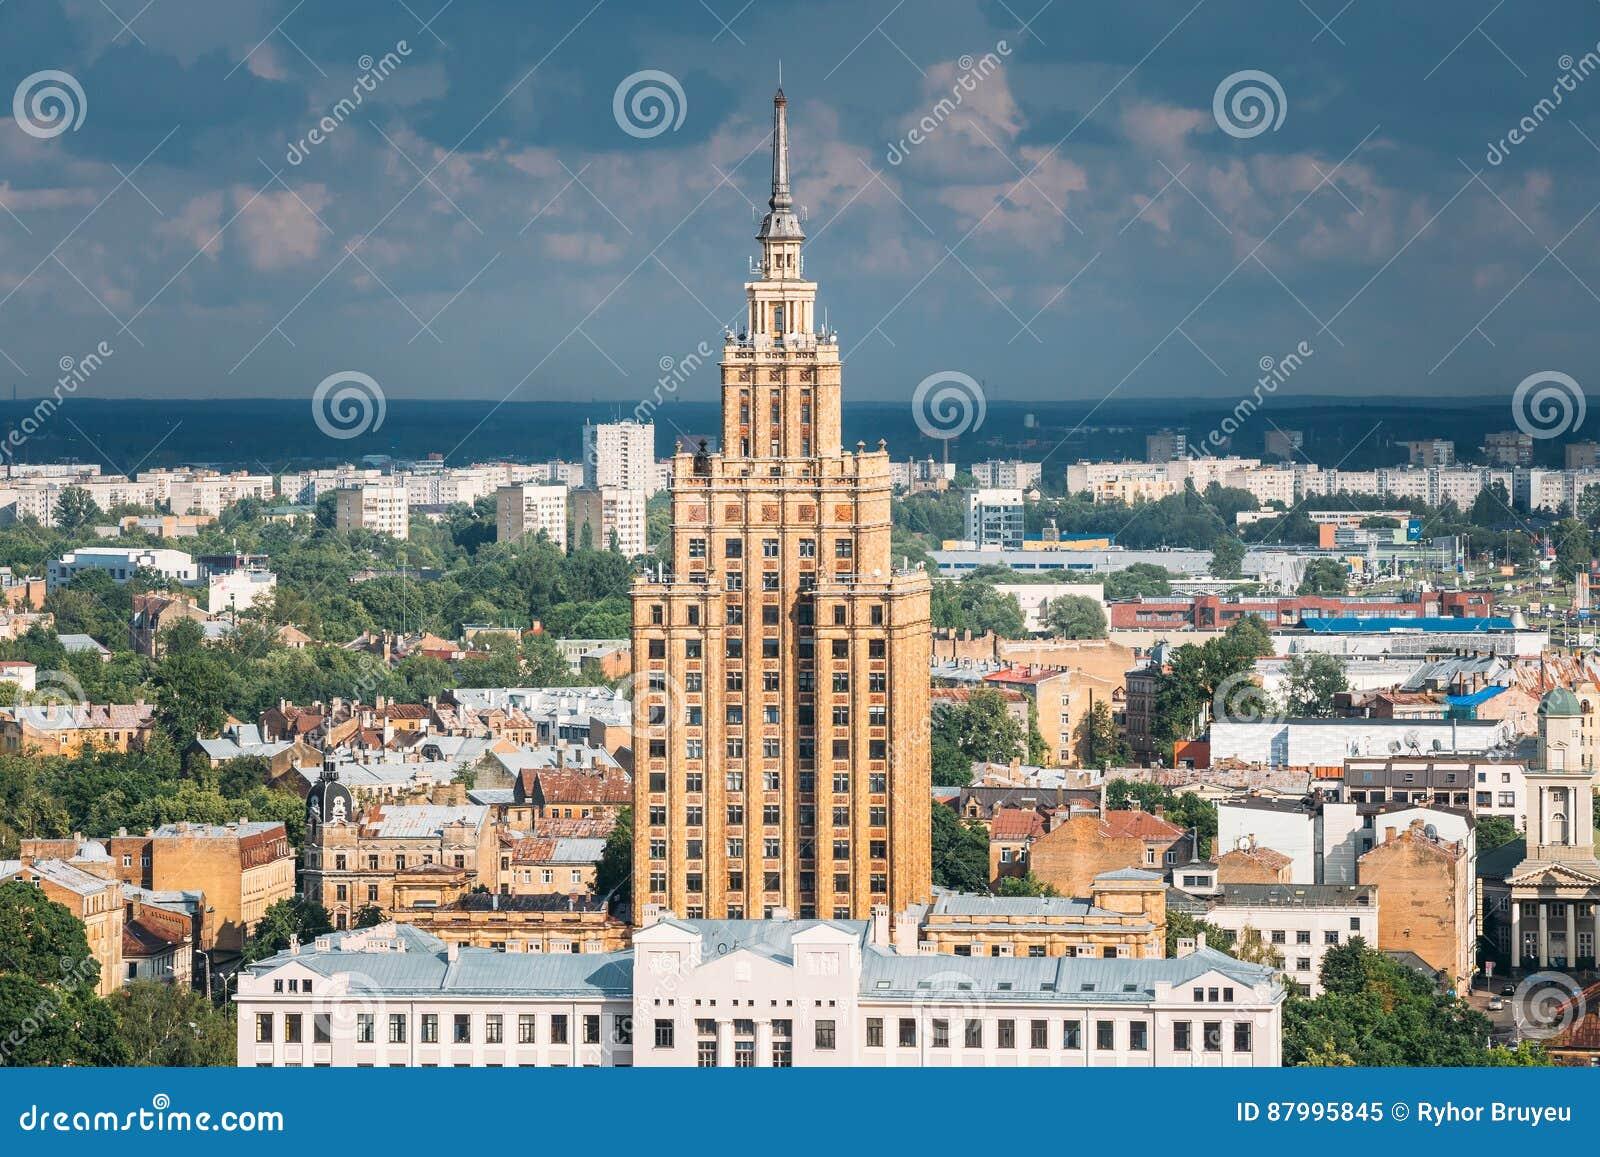 Riga, Latvia. Building of Latvian Academy of Sciences. Aerial